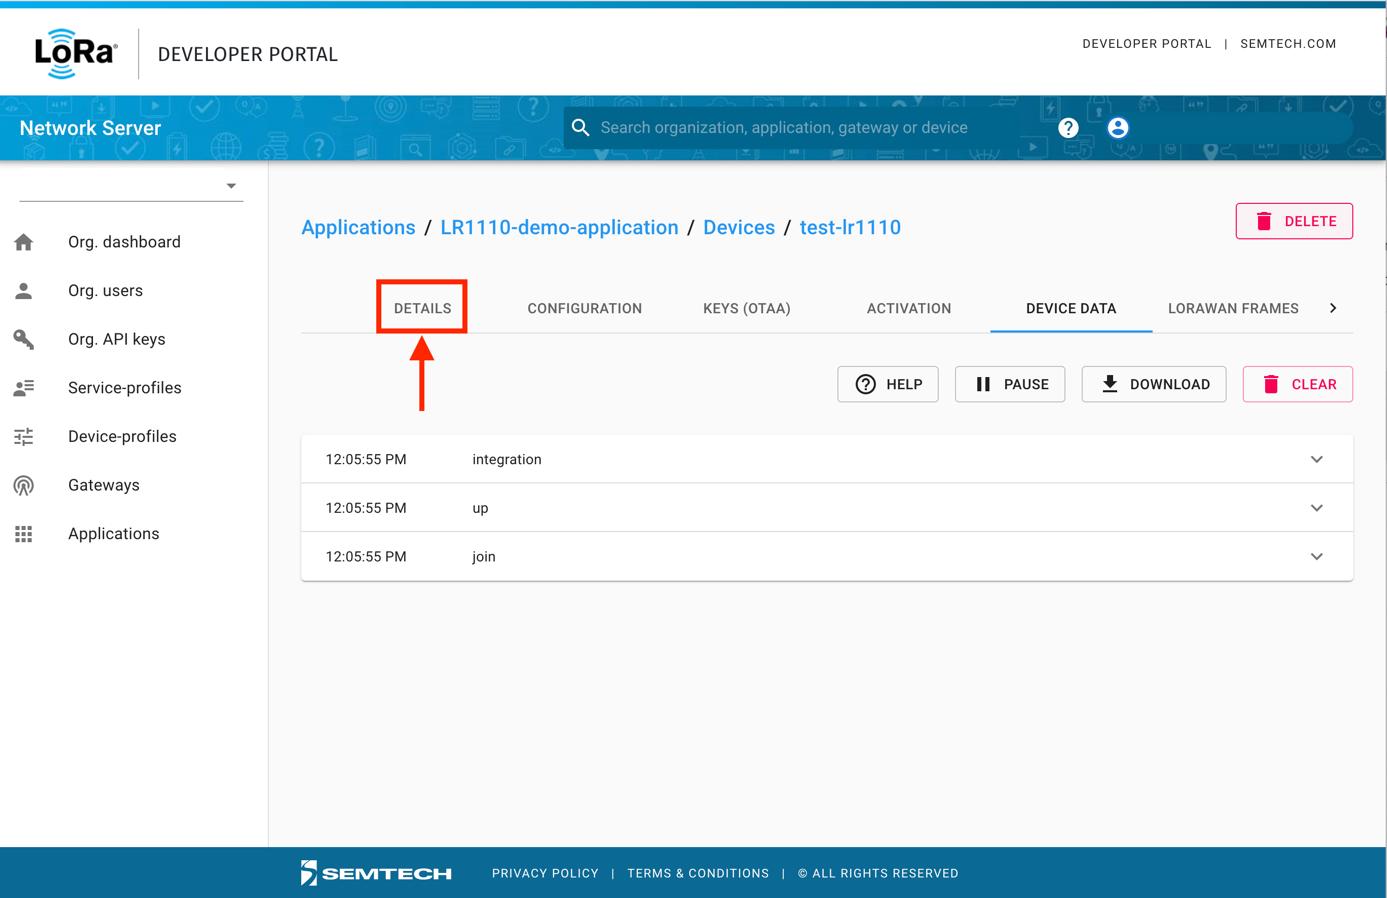 Semtech Network Server DETAILS Tab